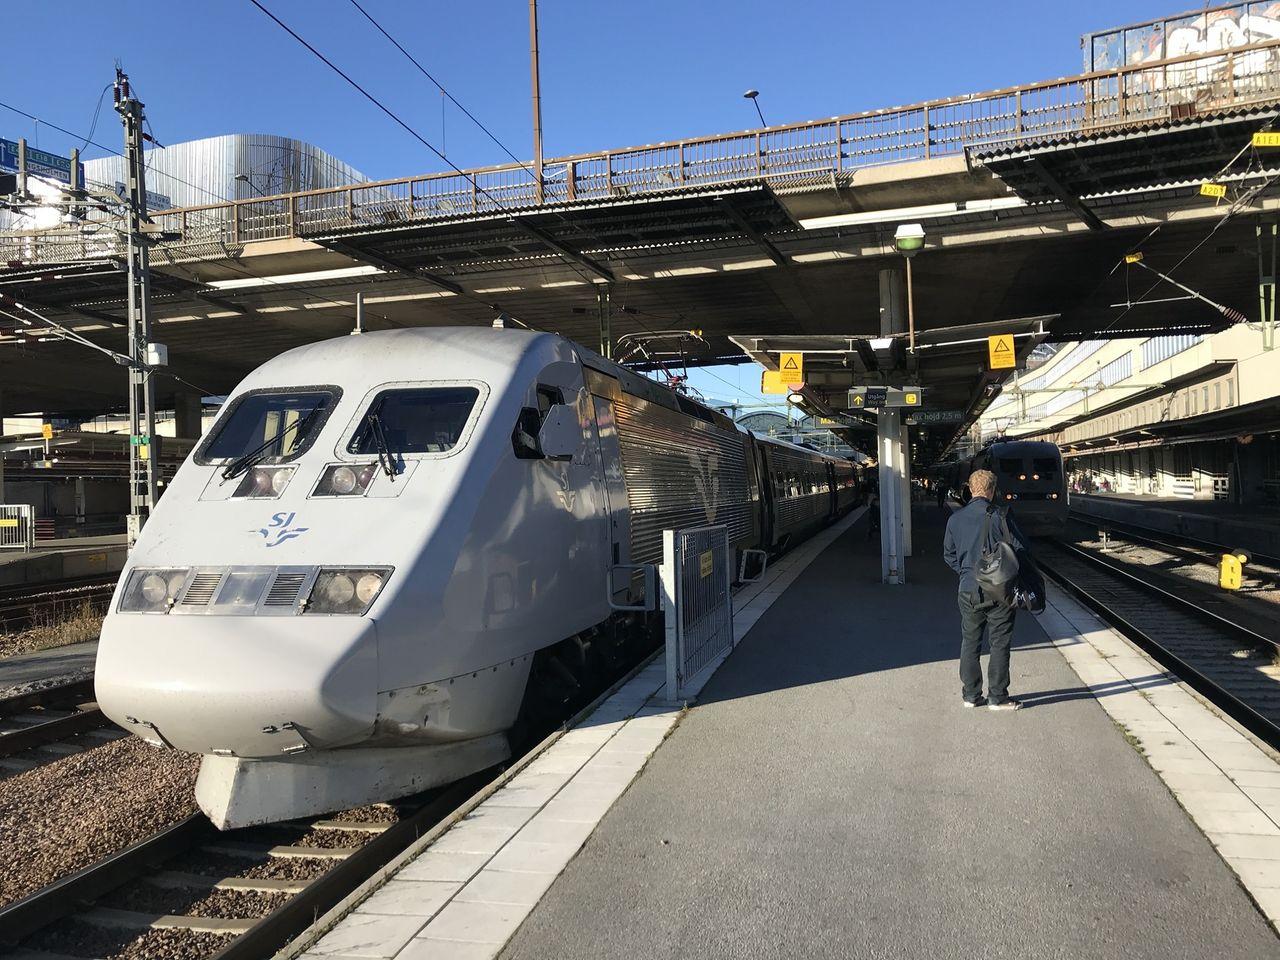 Nu ska Sveriges tåg få bättre mobiluppkopplingar